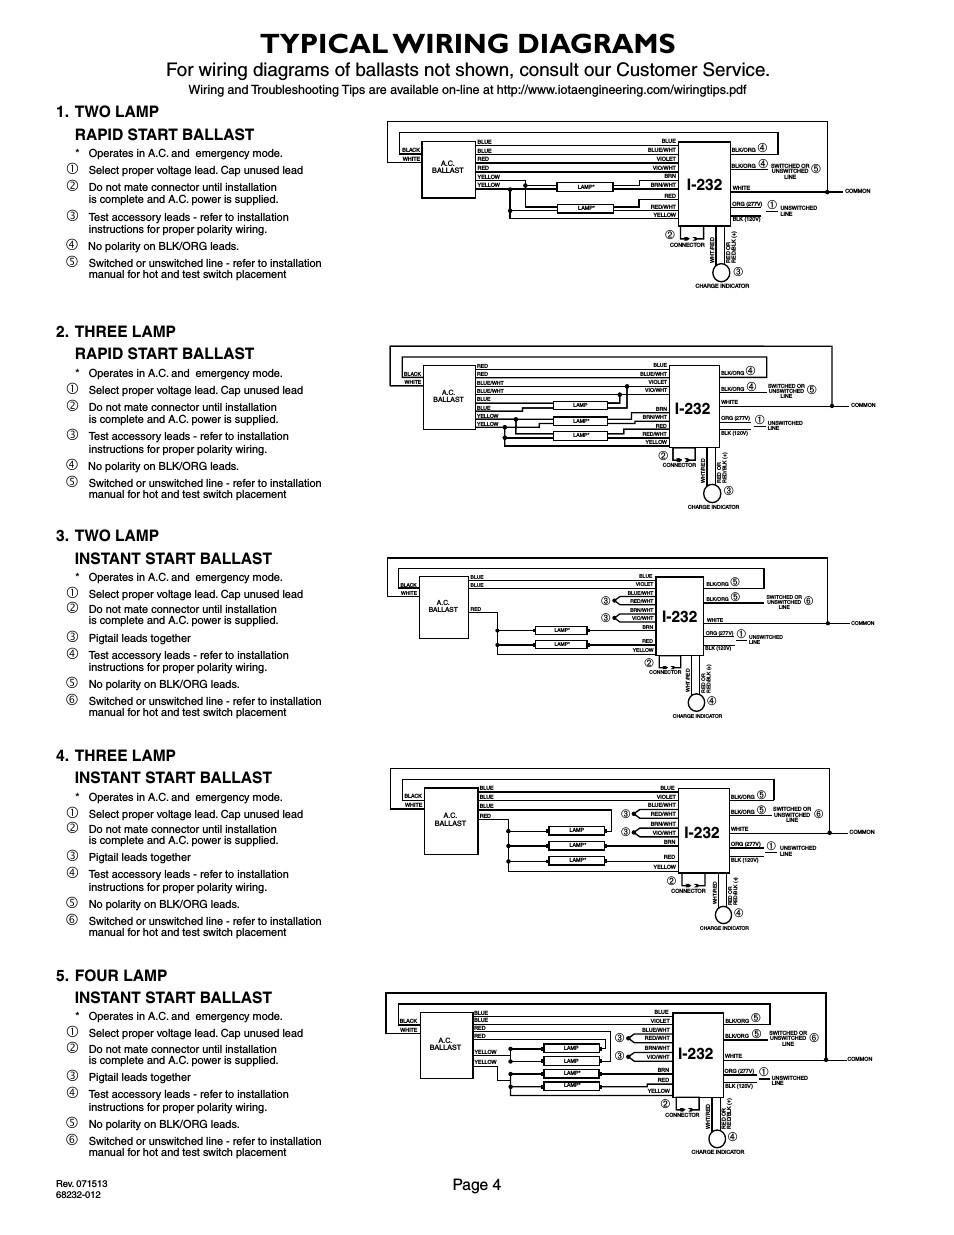 medium resolution of iota i320 emergency ballast wiring diagram download emergency ballast wiring 2 g download